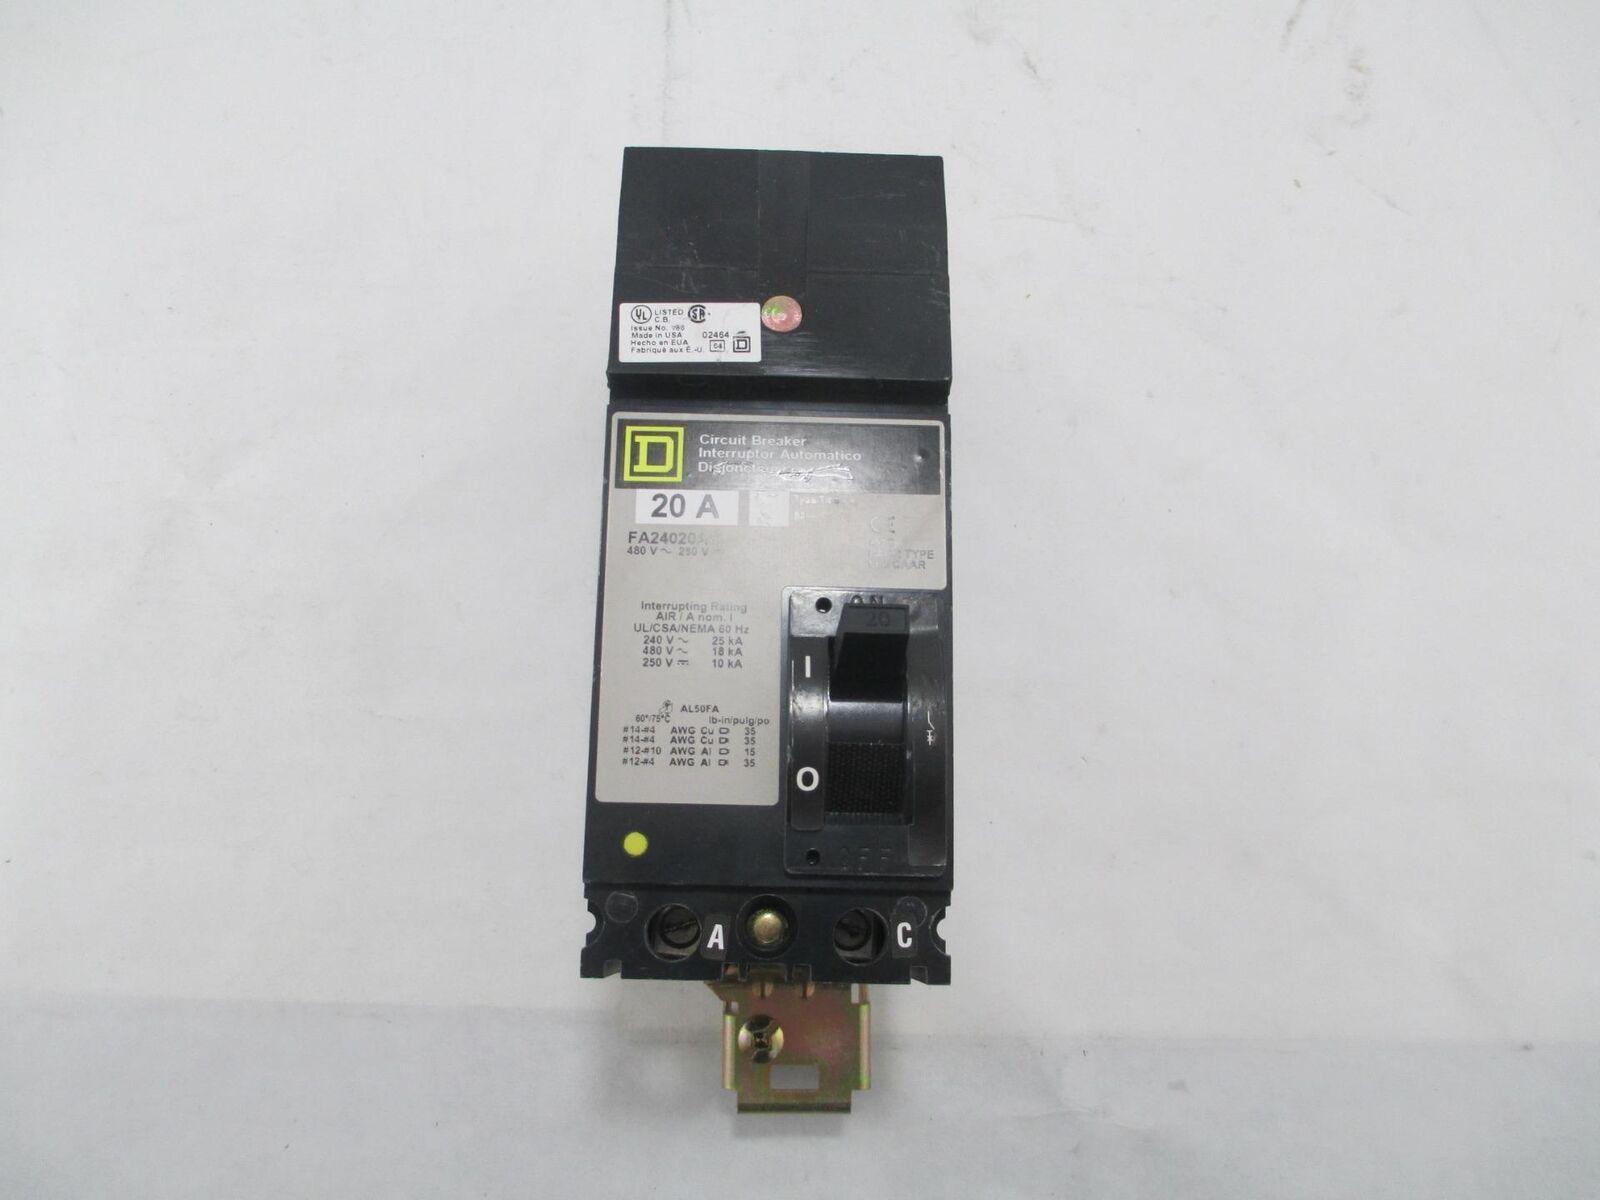 Square D FA24020AC 2-Pole 480 Volt 20 Amp I-Line Circuit Breaker